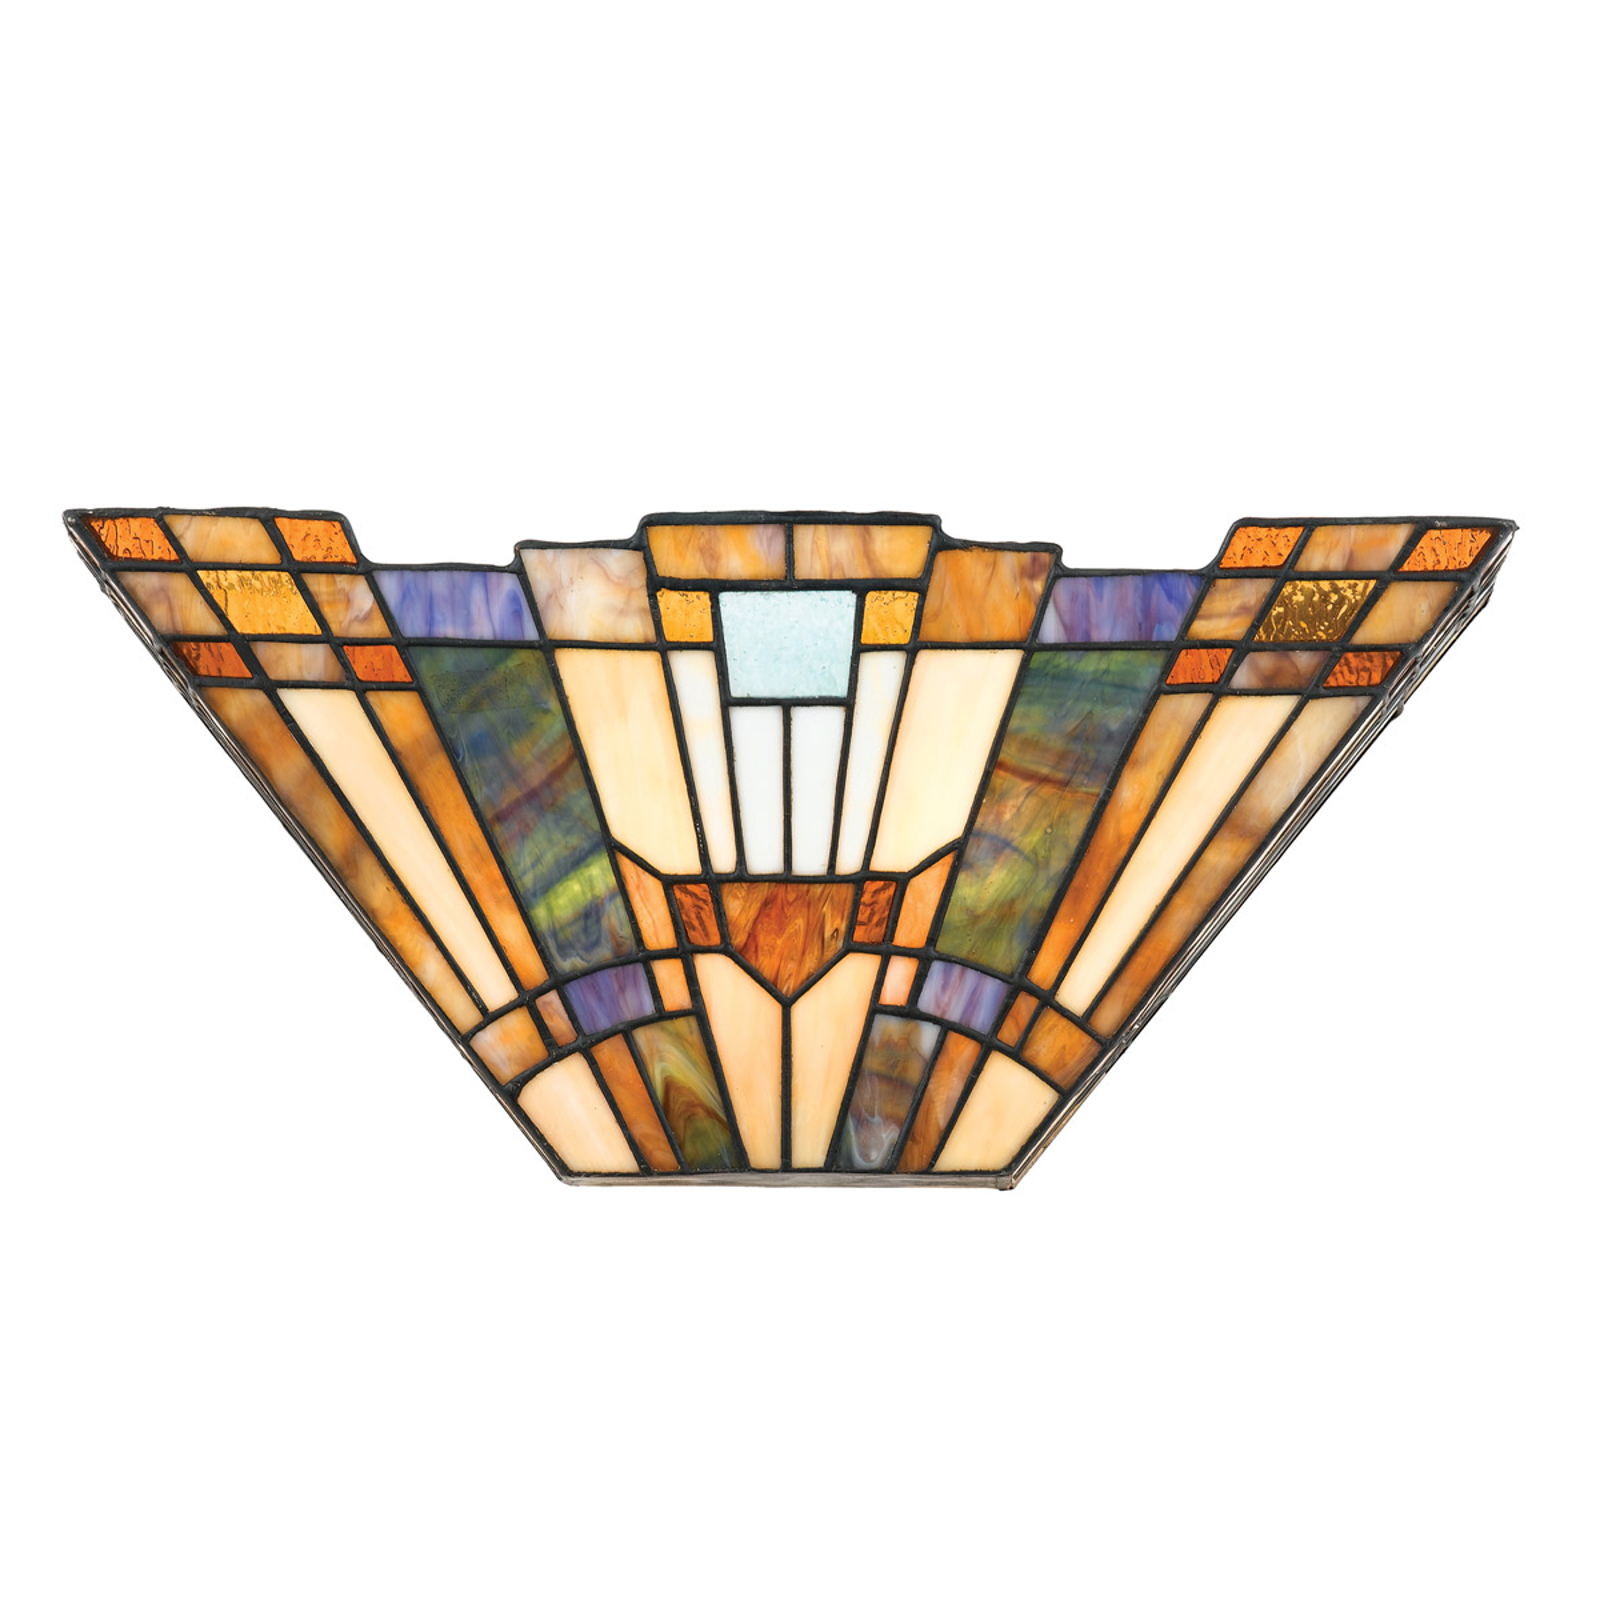 Lámpara de pared rica en matices Inglenook